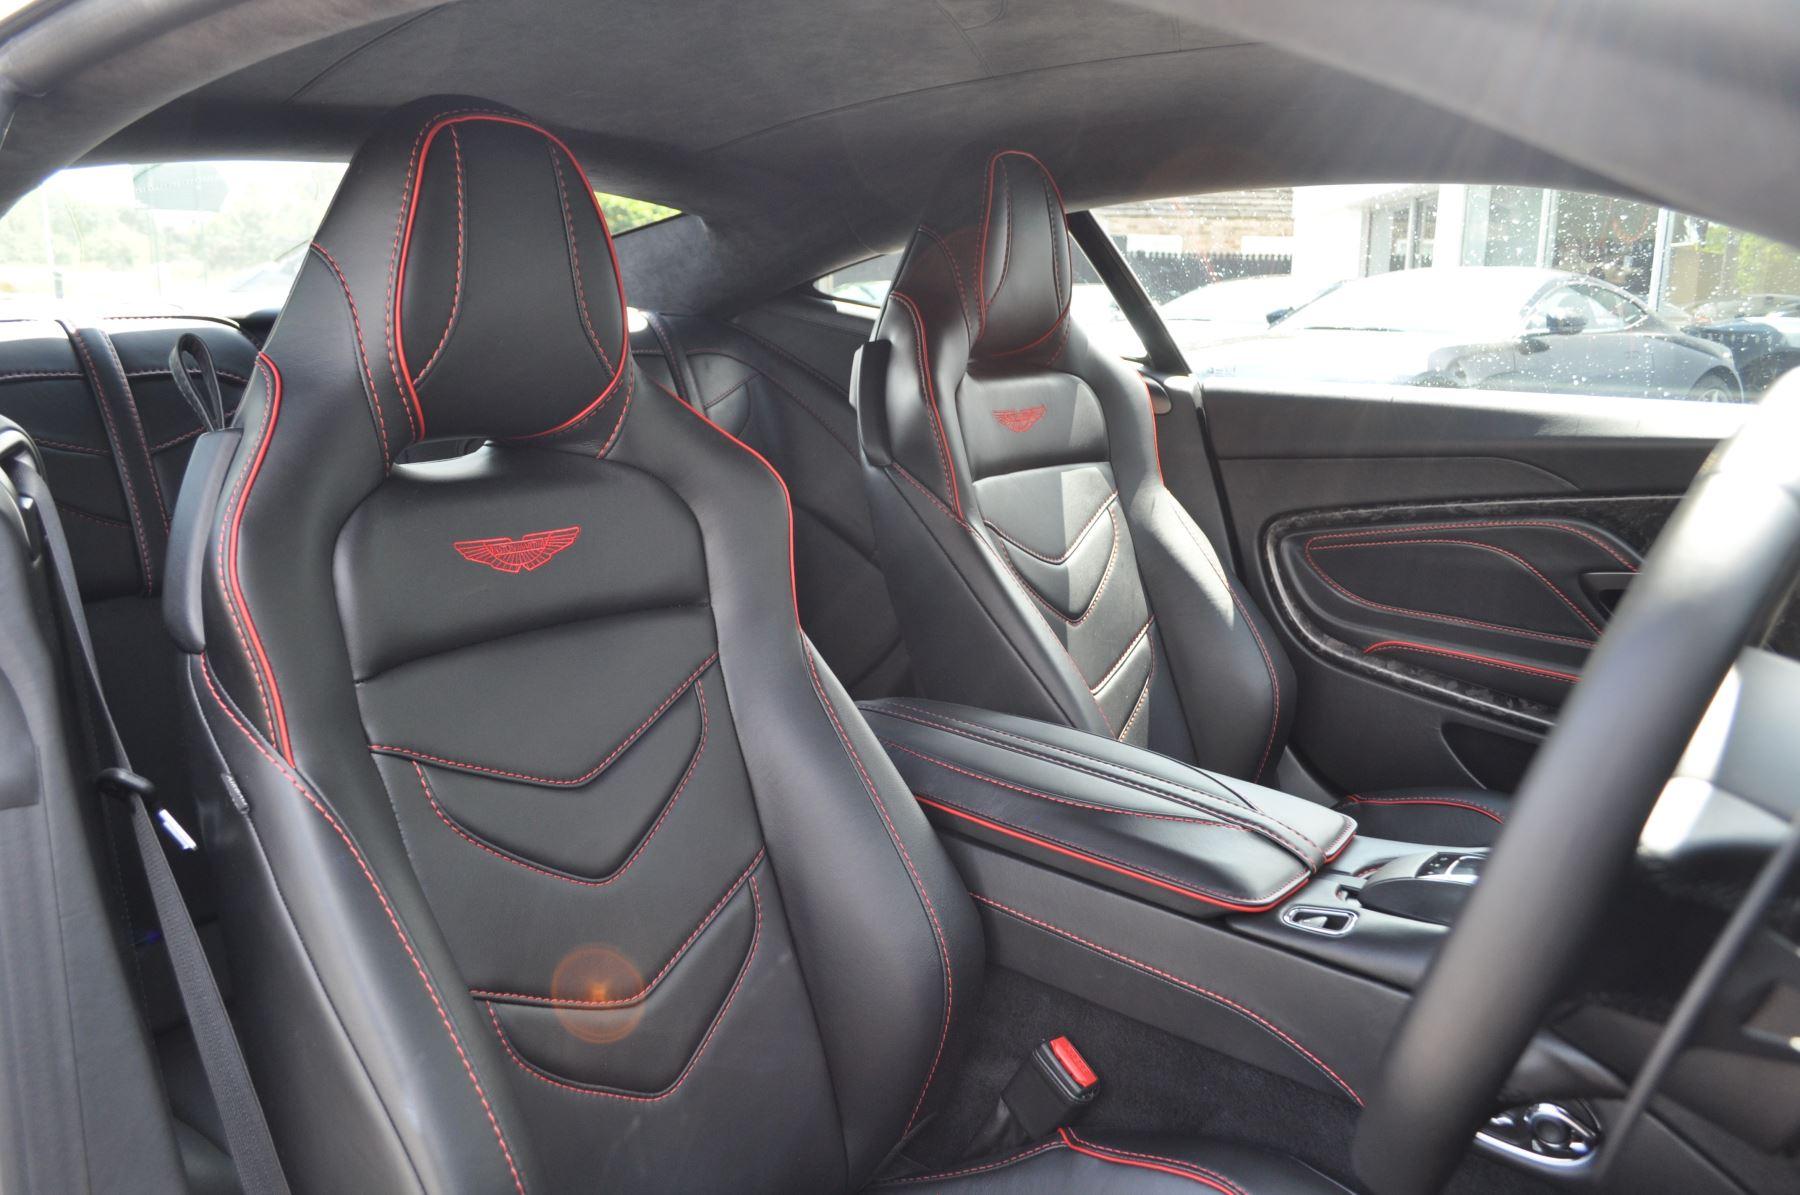 Aston Martin DBS V12 Superleggera Touchtronic image 9